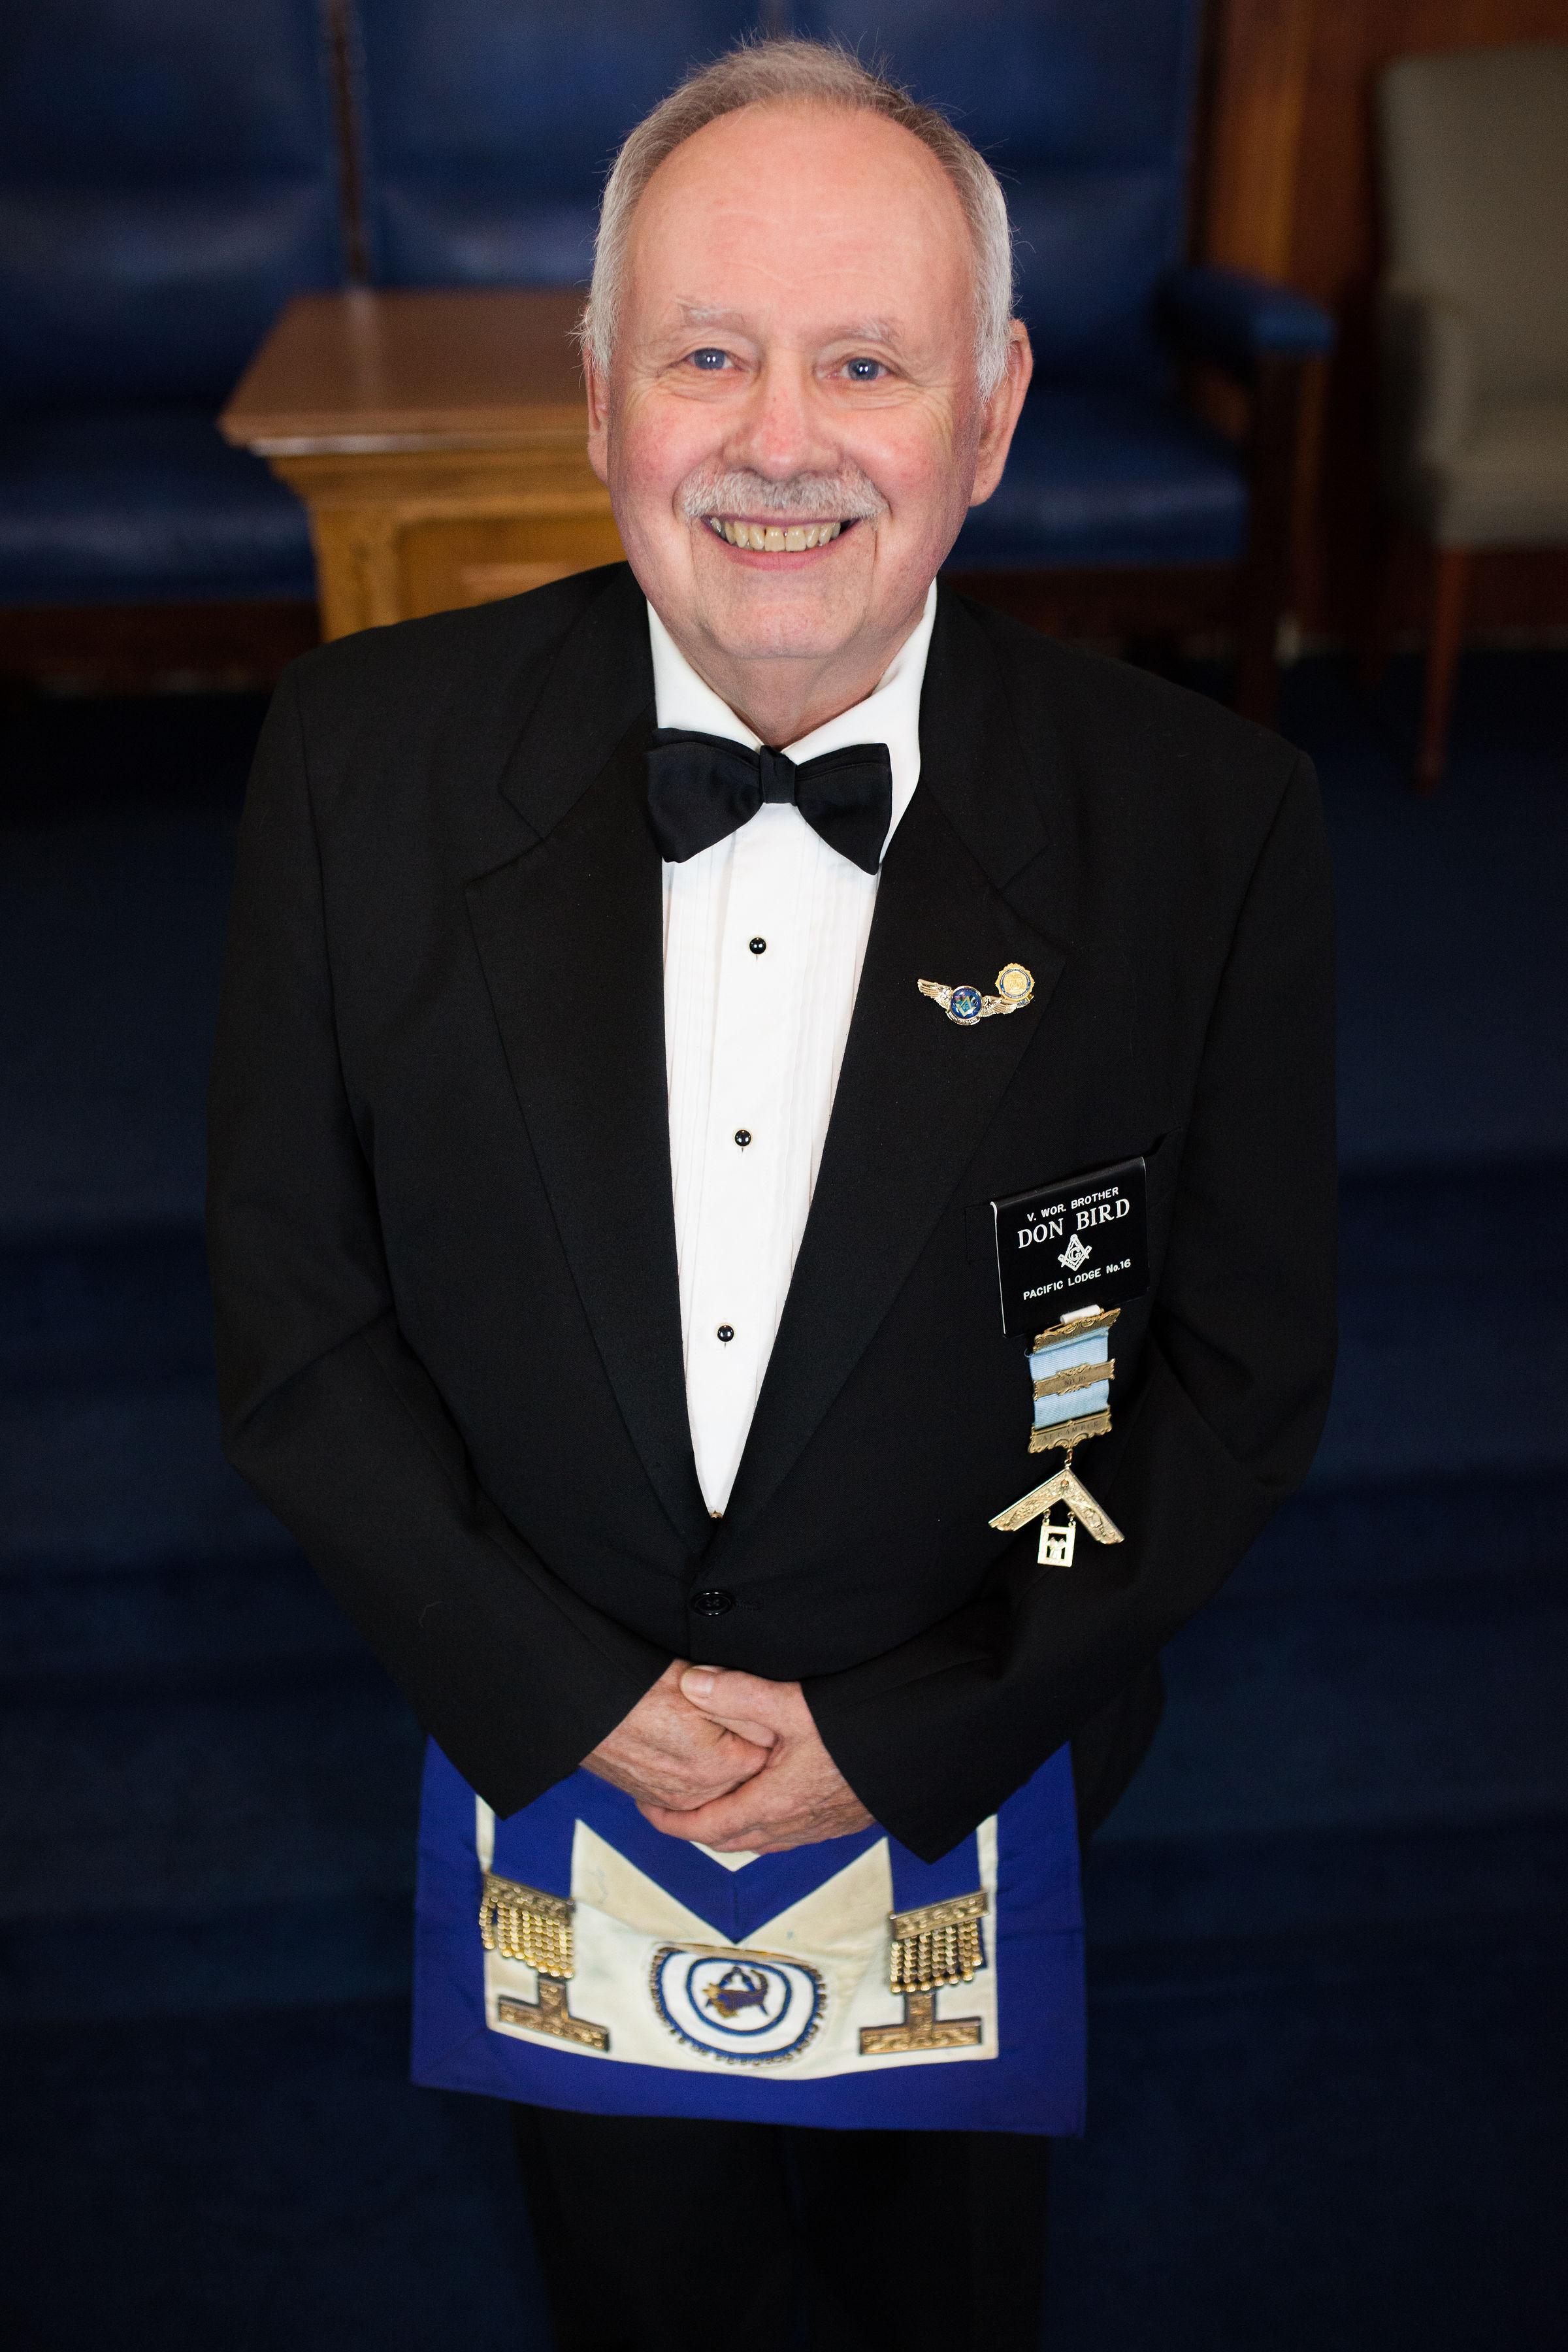 Historian - V.W. Bro. Don Bird